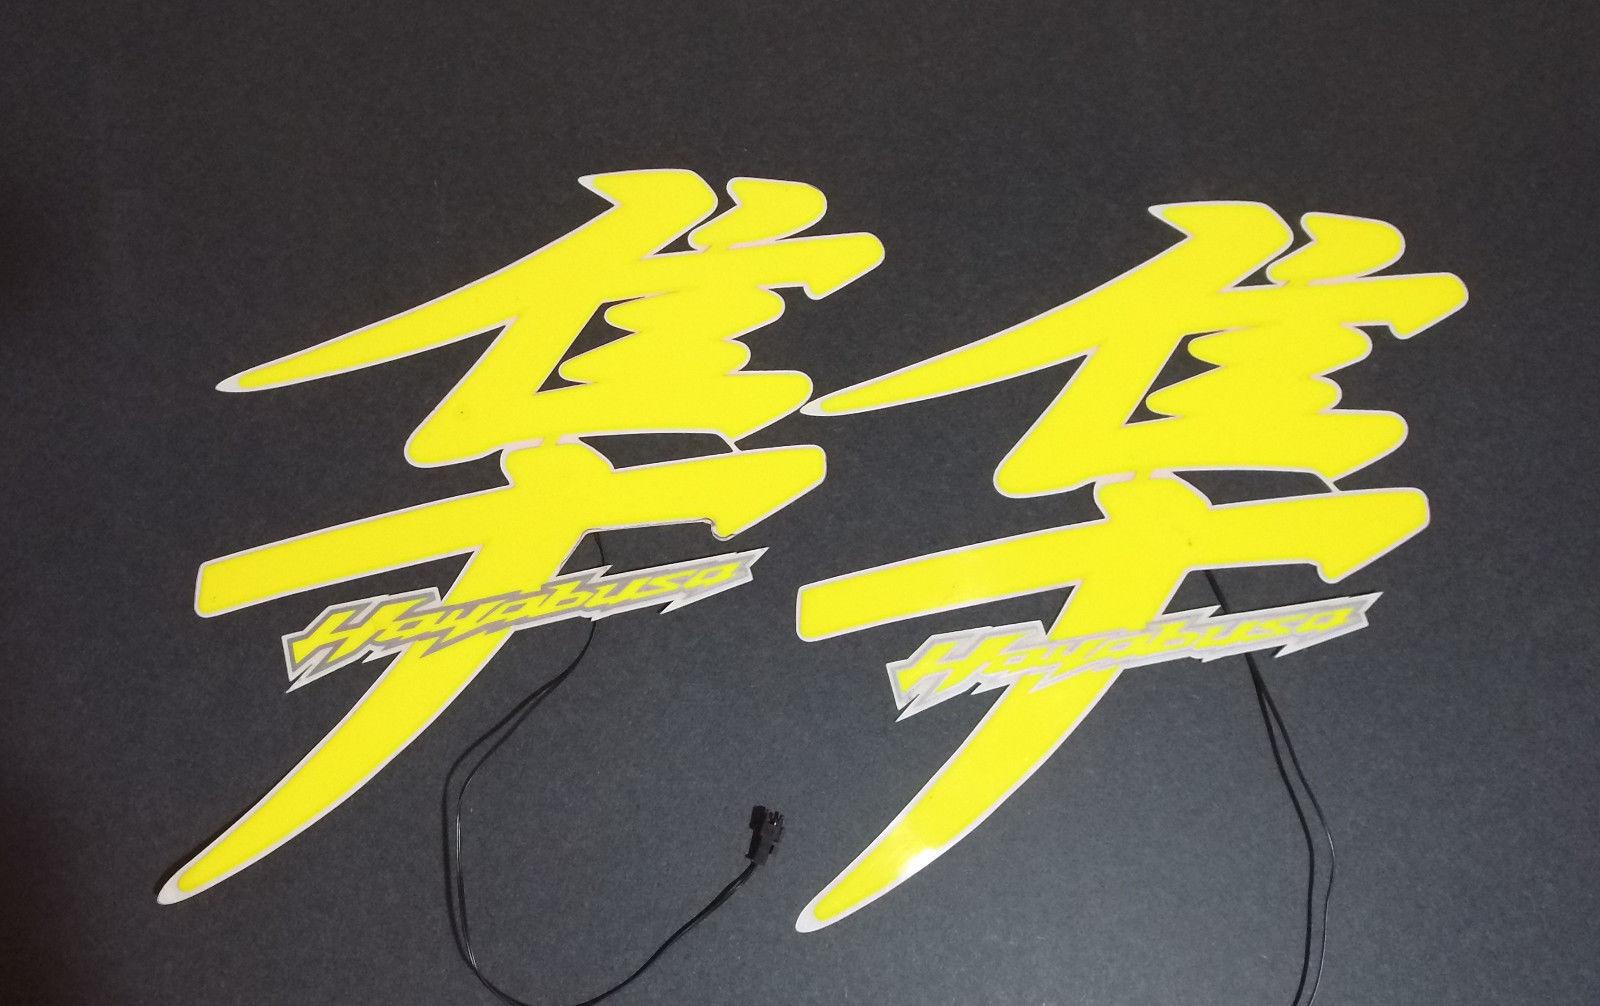 Hayabusa sticker/decal Lighted/Illuminated and 50 similar items